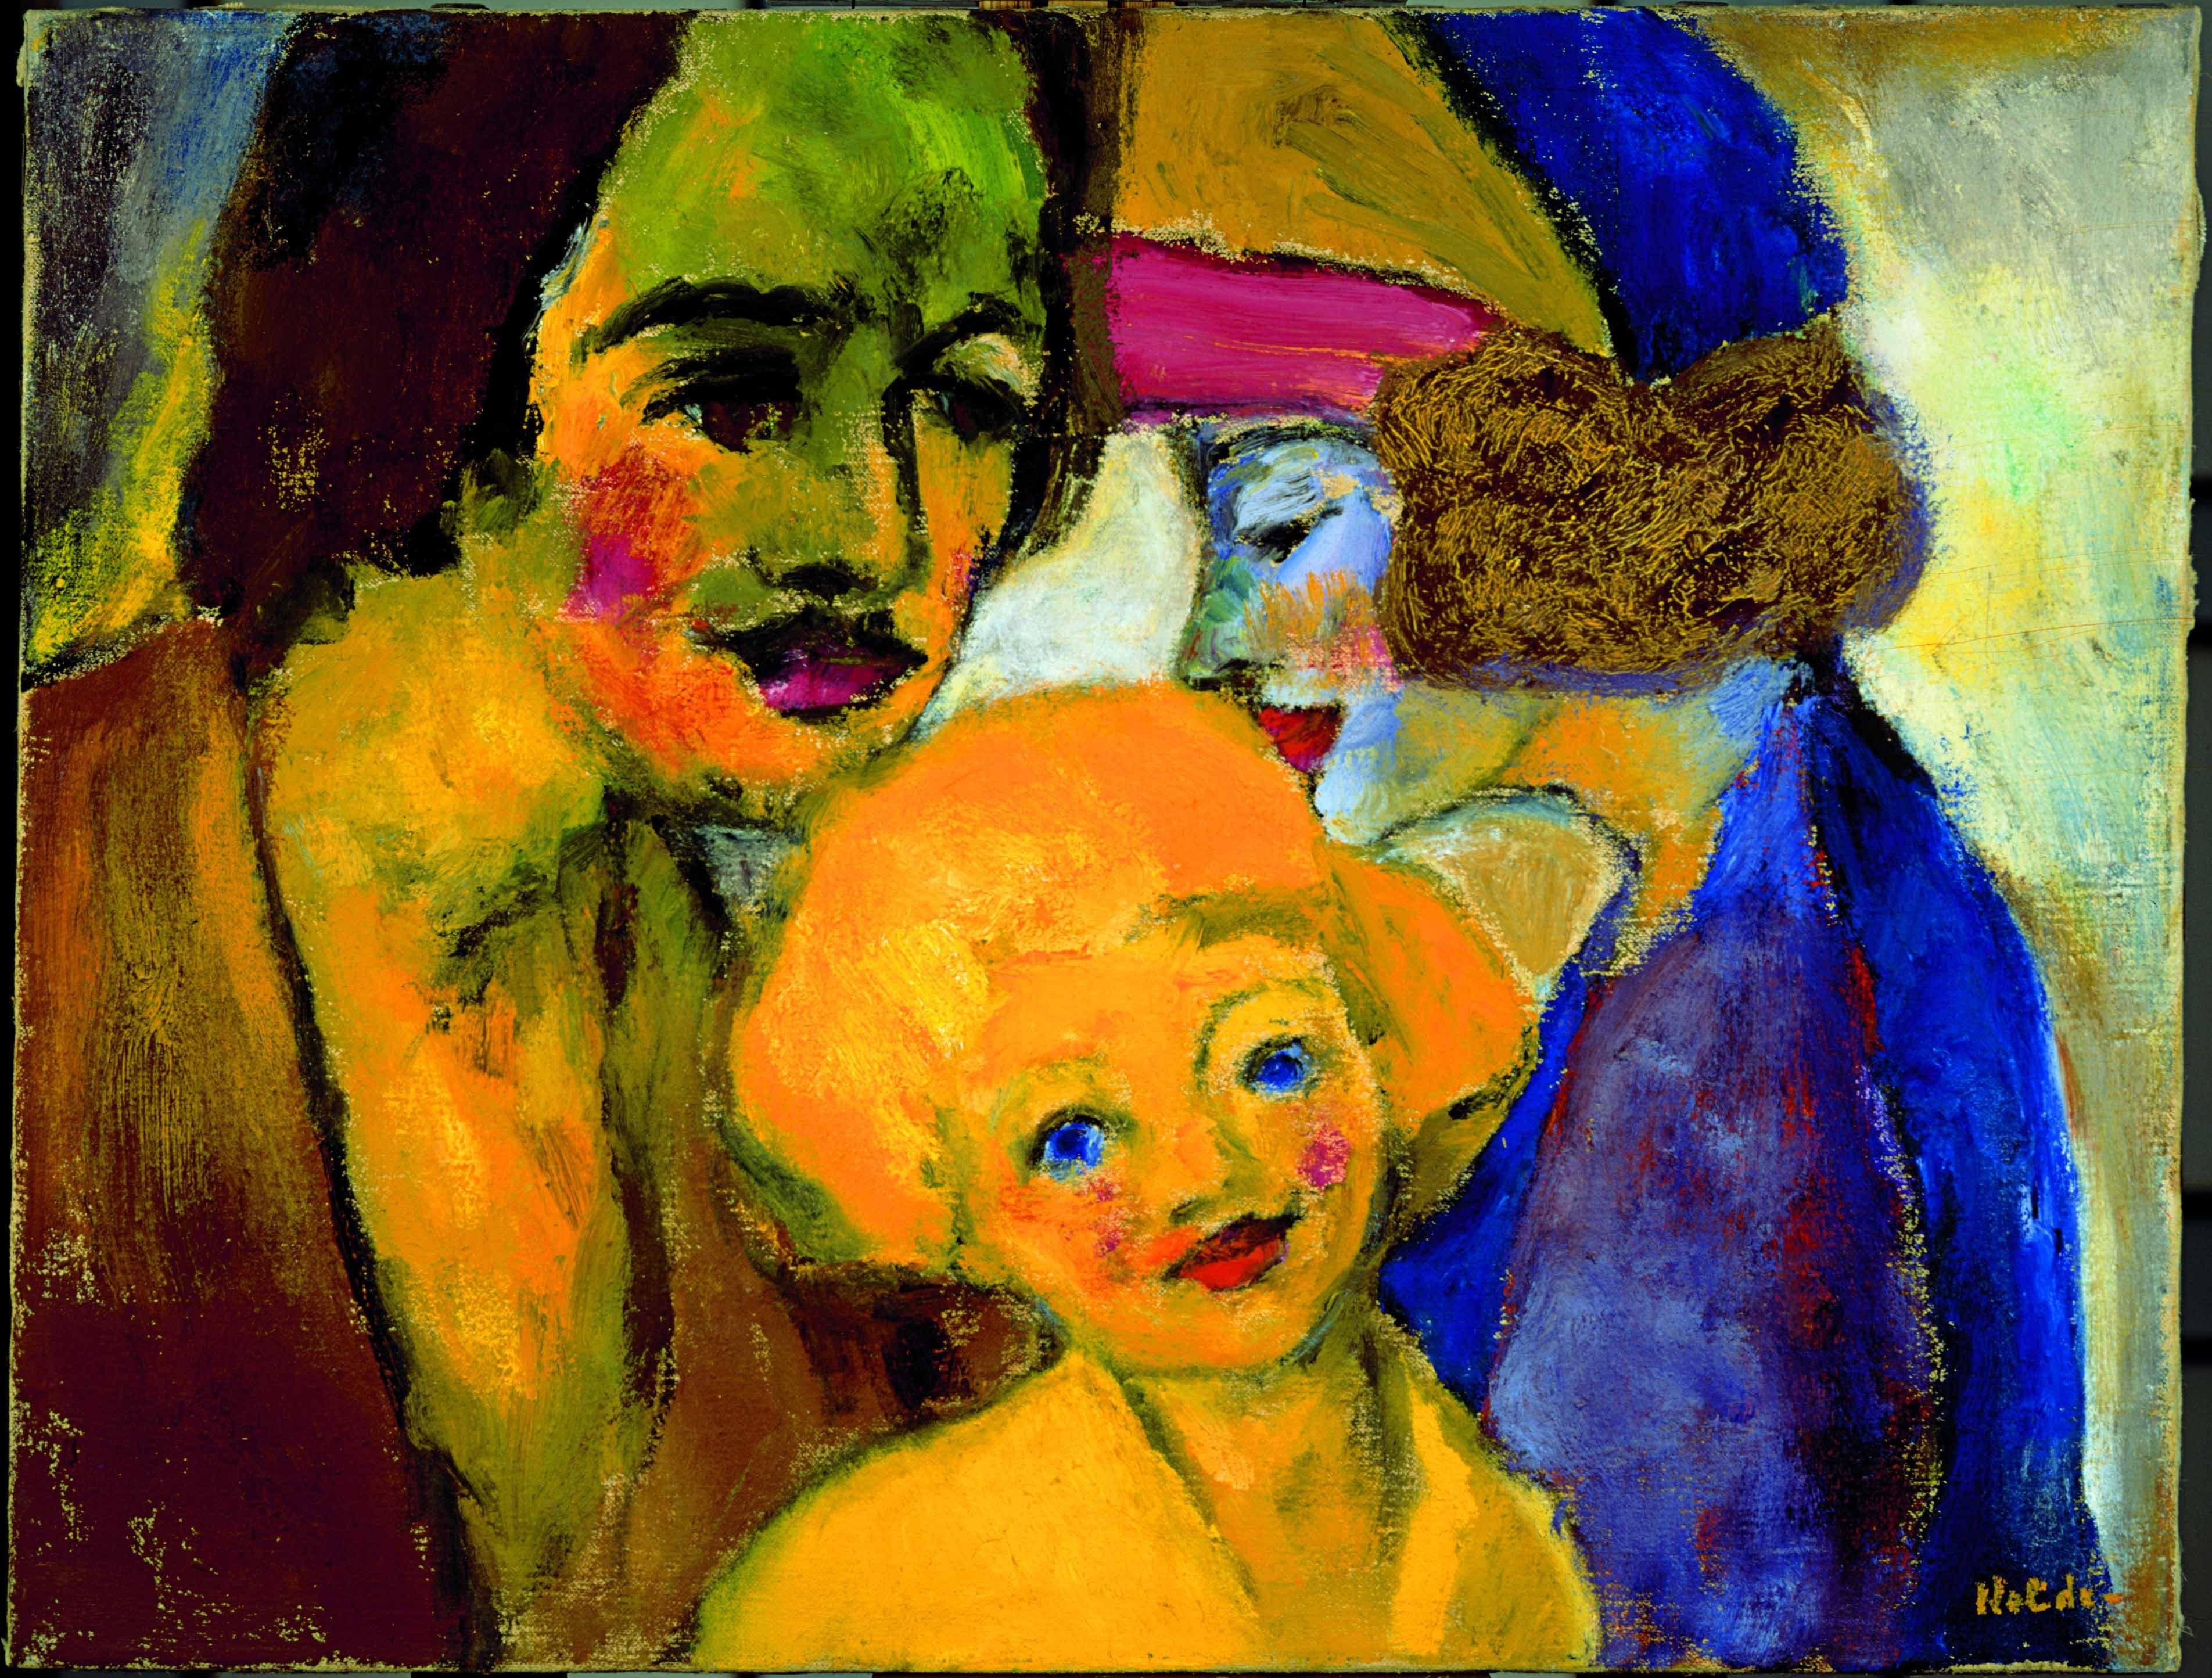 Erotic paintings of andrzej malinowski - 1 9